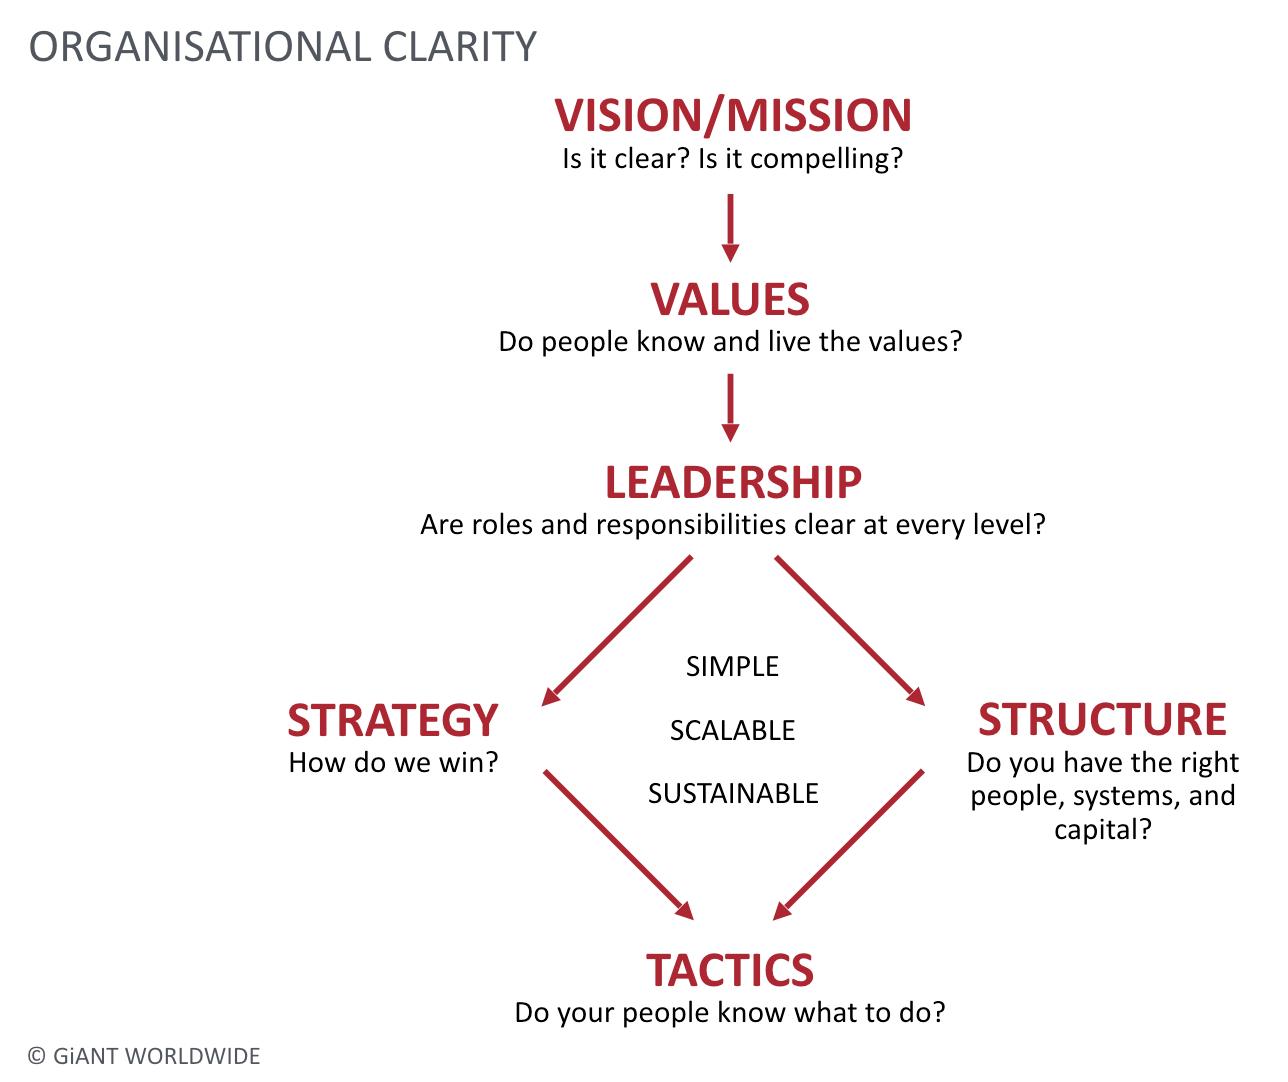 GiANT worldwide organisational clarity model